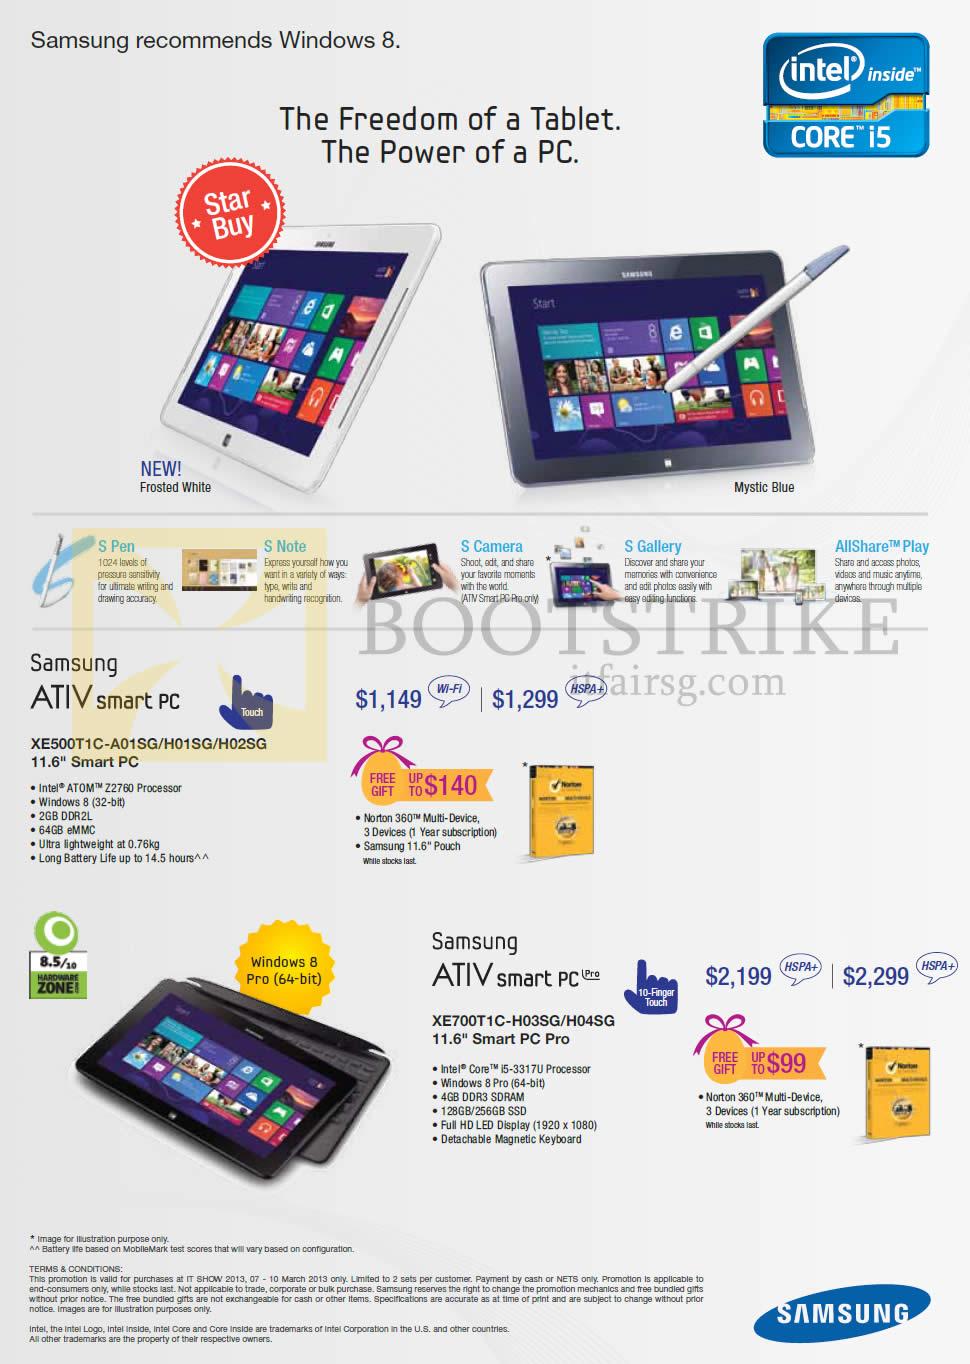 IT SHOW 2013 price list image brochure of Samsung Tablets ATIV Smart PC XE500T1C-A01SG H01SG H02SG, Pro XE700T1C-H03SG H04SG